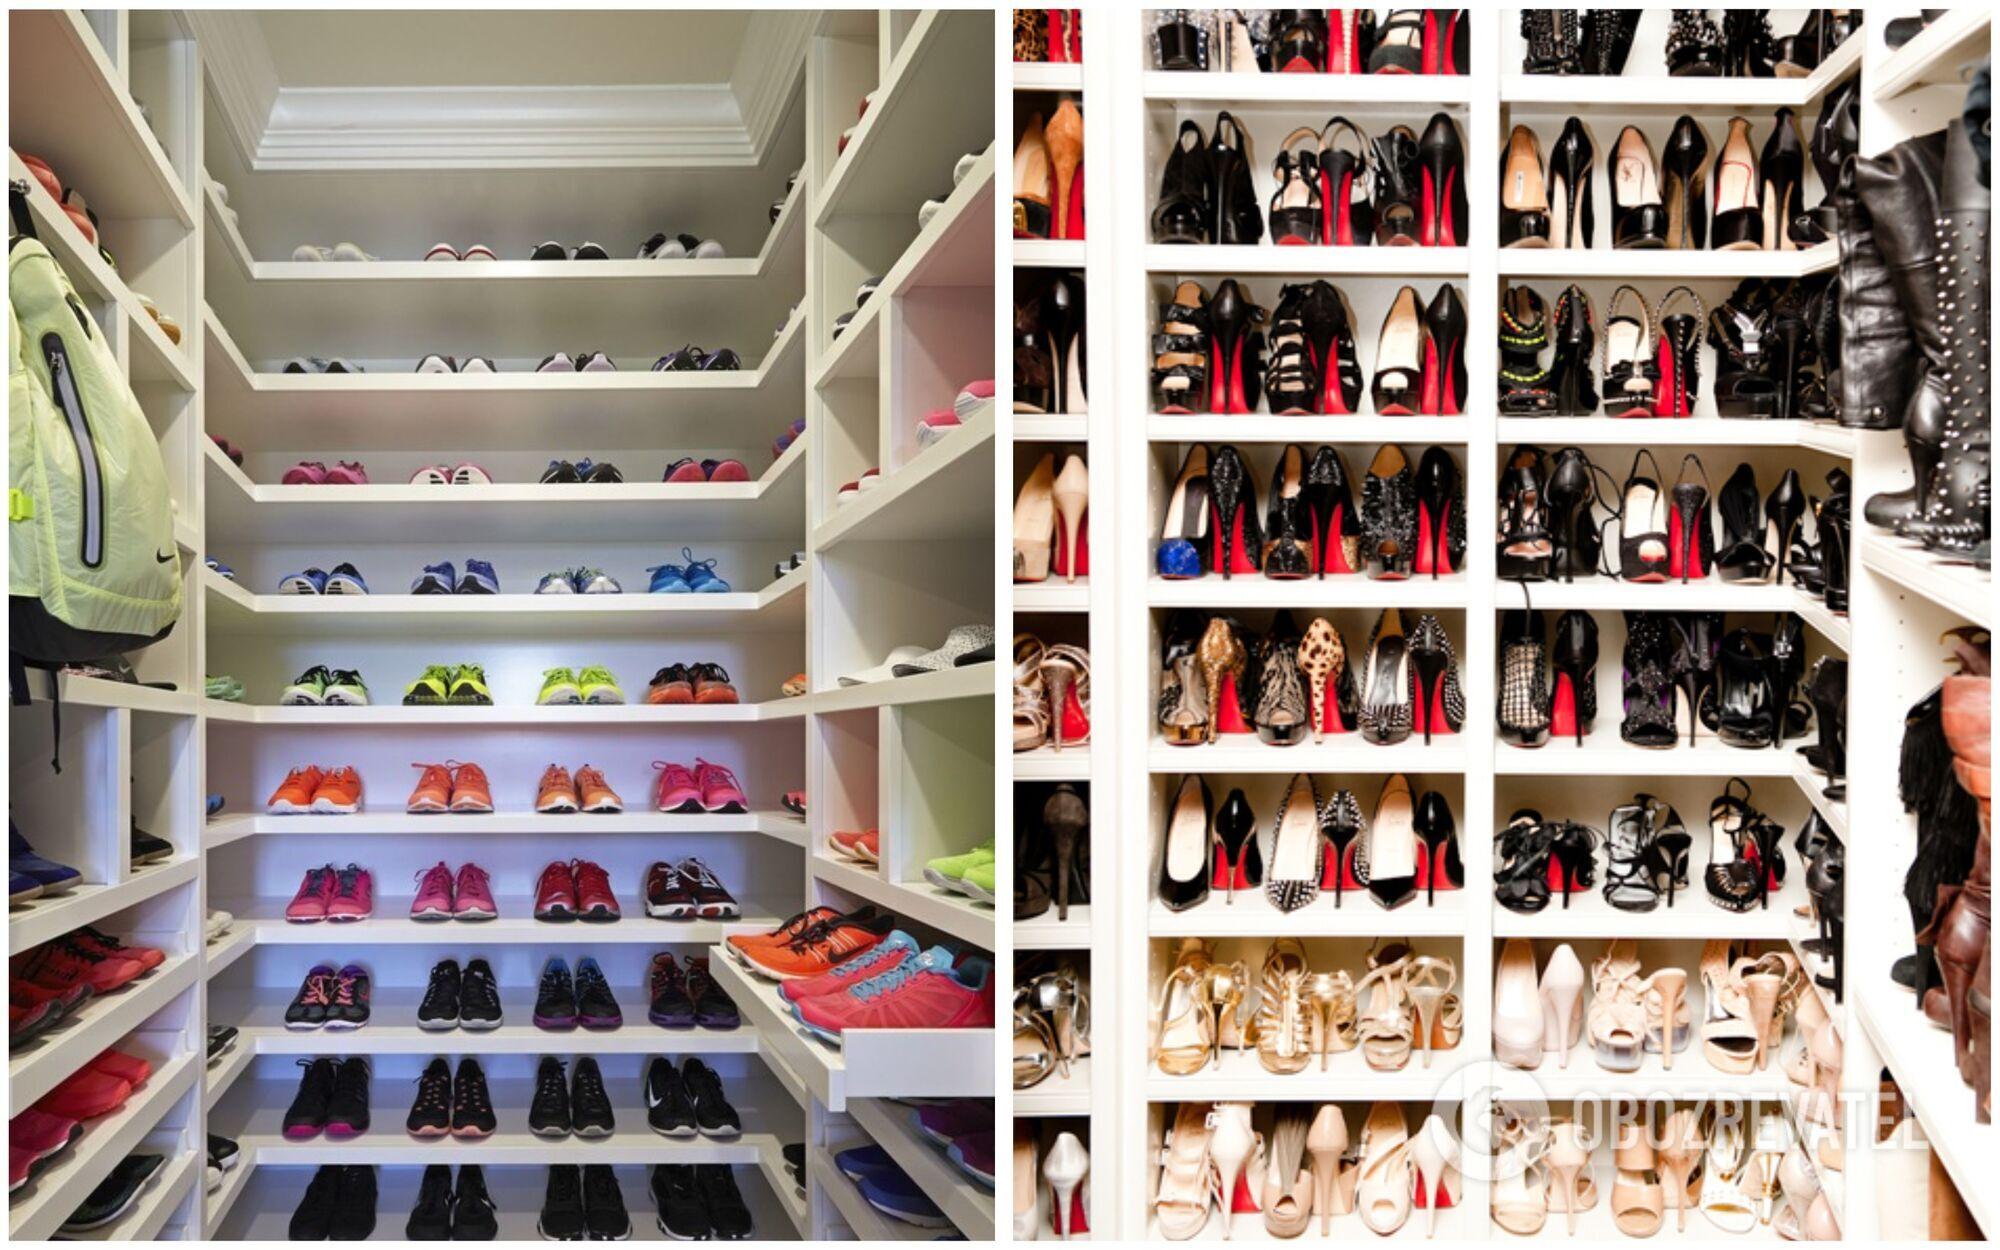 Хлои Кардашьян – настоящая фанатка обуви